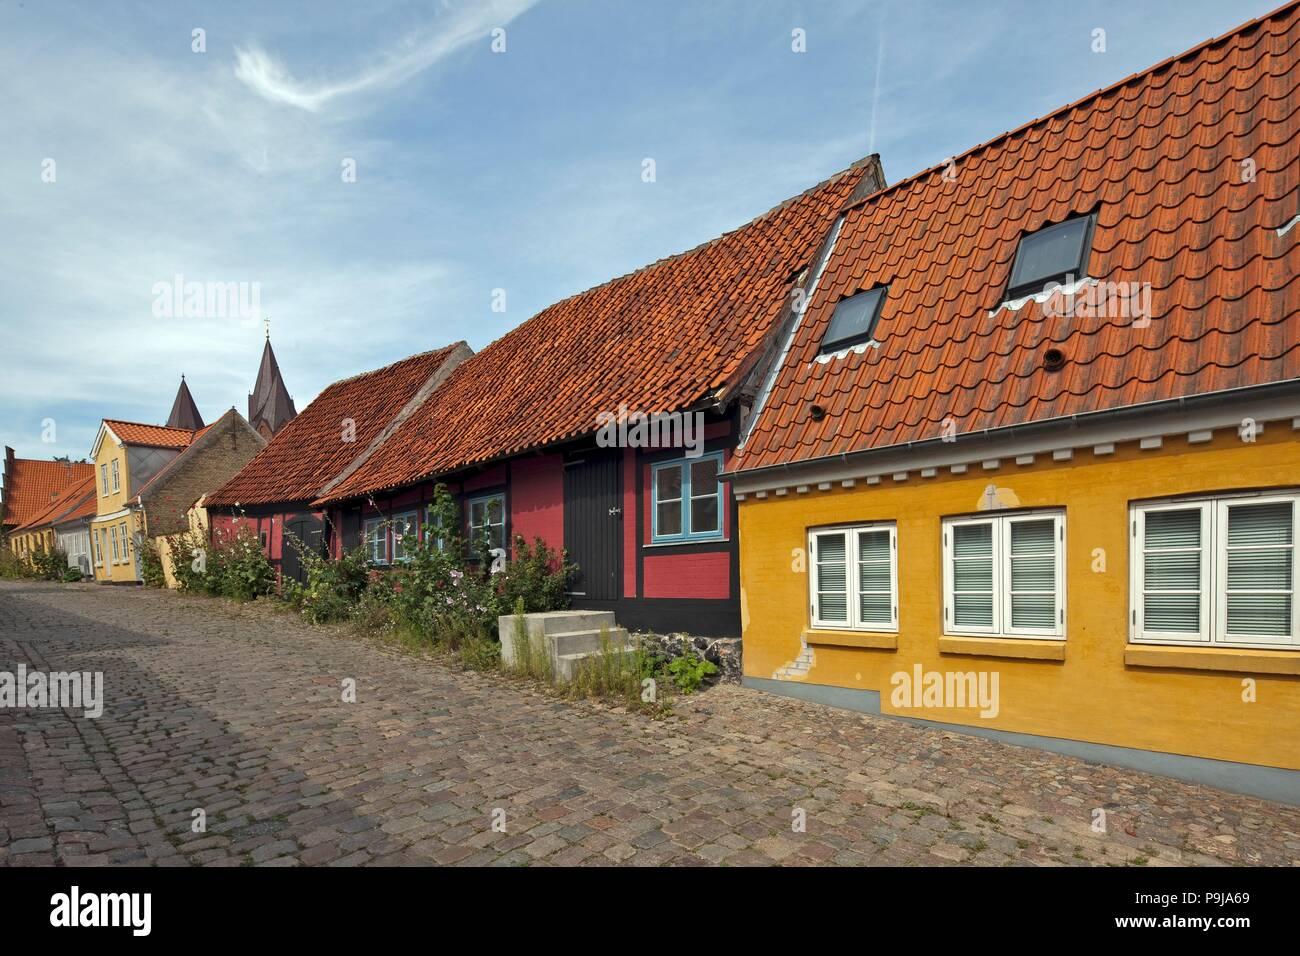 Wooden houses by old street in Kalundborg, Denmark - Stock Image